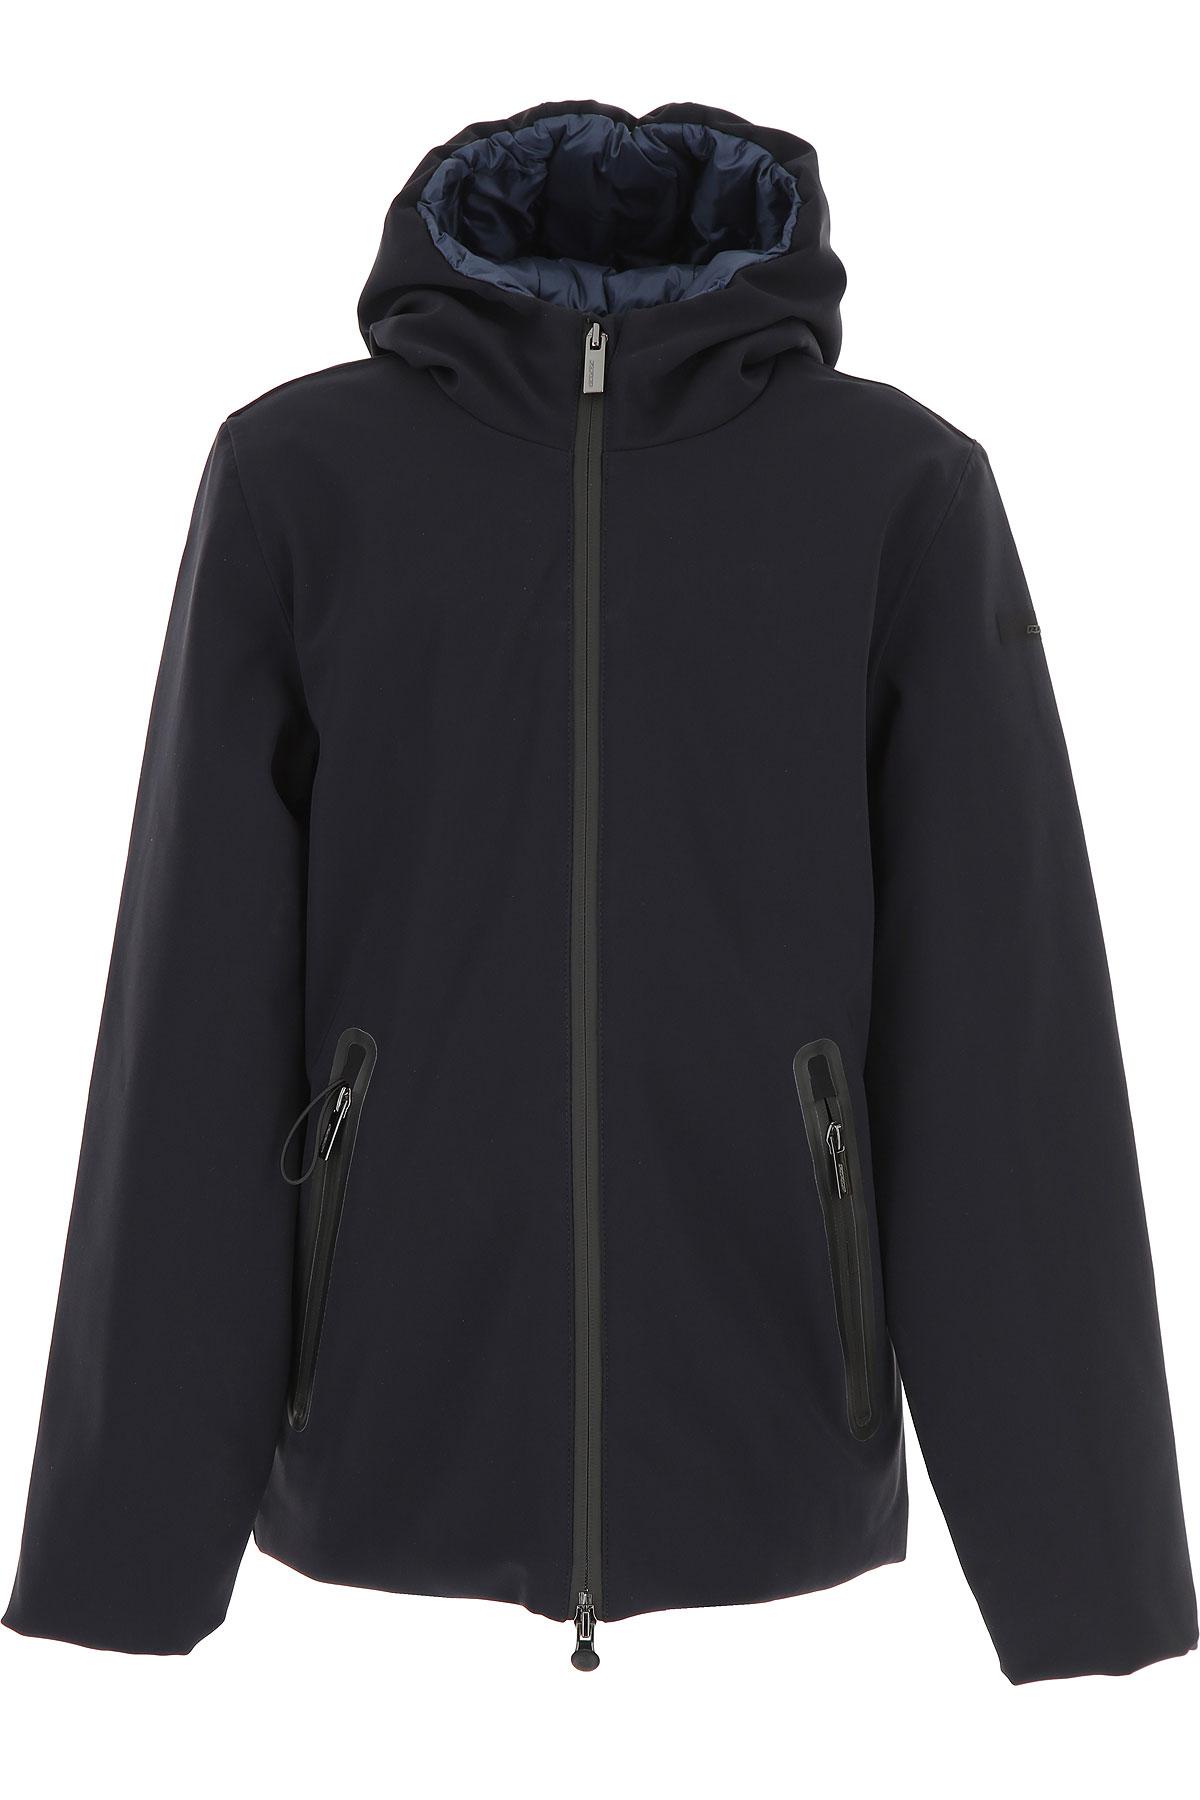 Image of RRD Boys Down Jacket for Kids, Puffer Ski Jacket, Blue, polyamide, 2017, 14Y 16Y